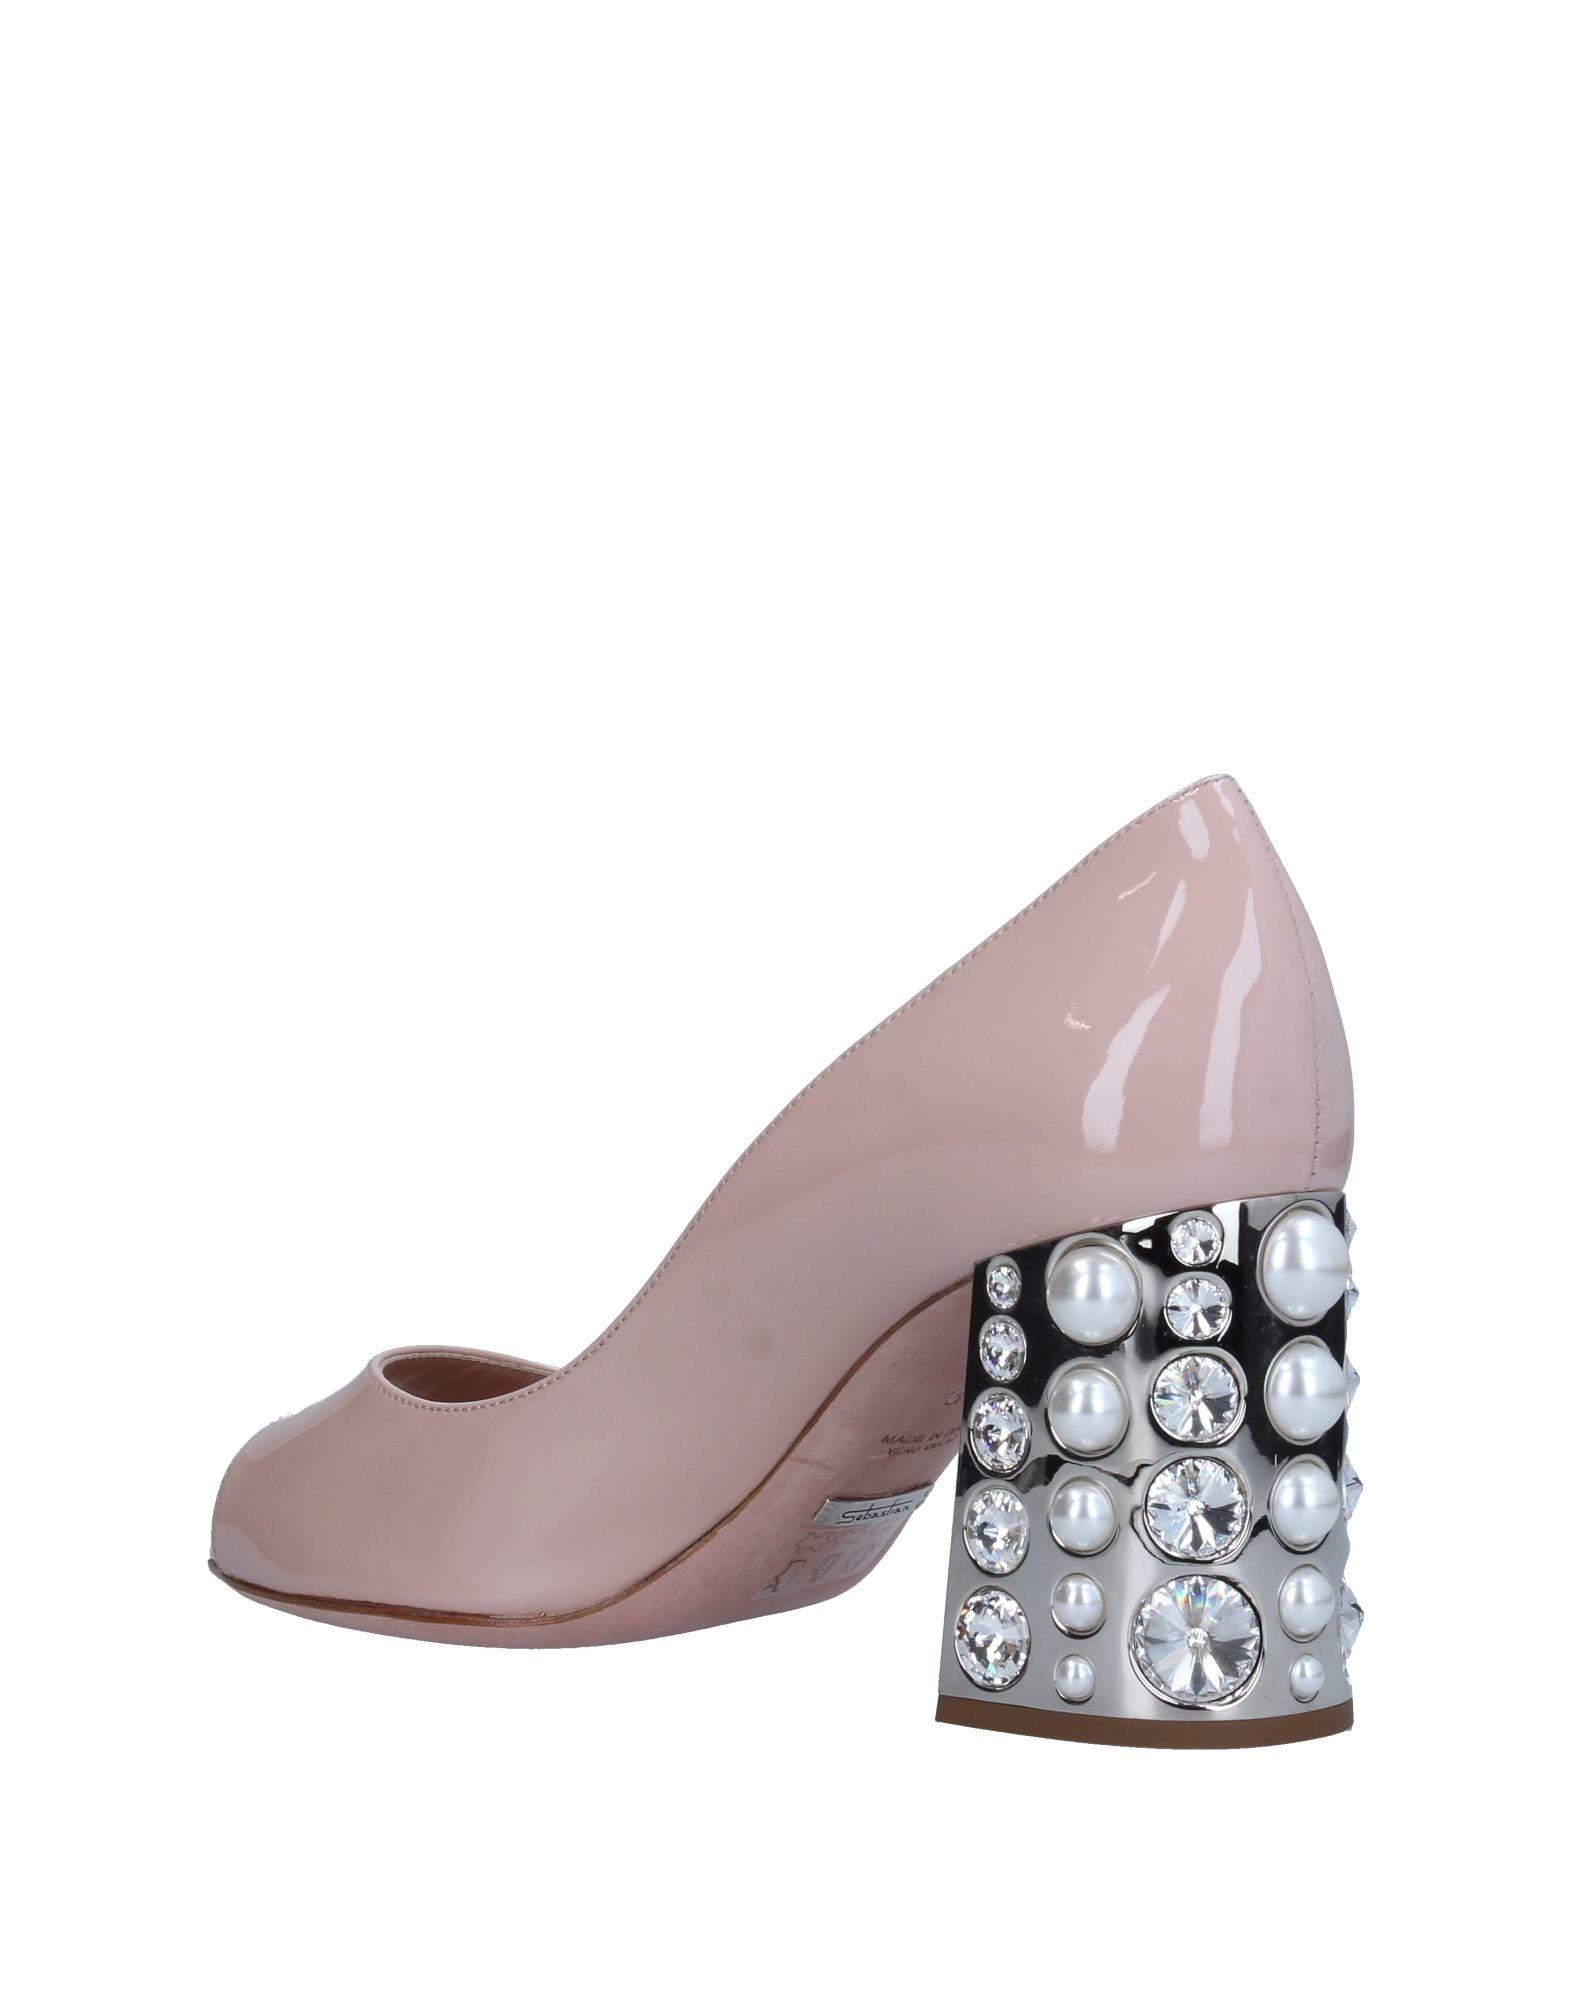 Sebastian Pumps Damen  11331690QMGut 11331690QMGut 11331690QMGut aussehende strapazierfähige Schuhe 8af3c2